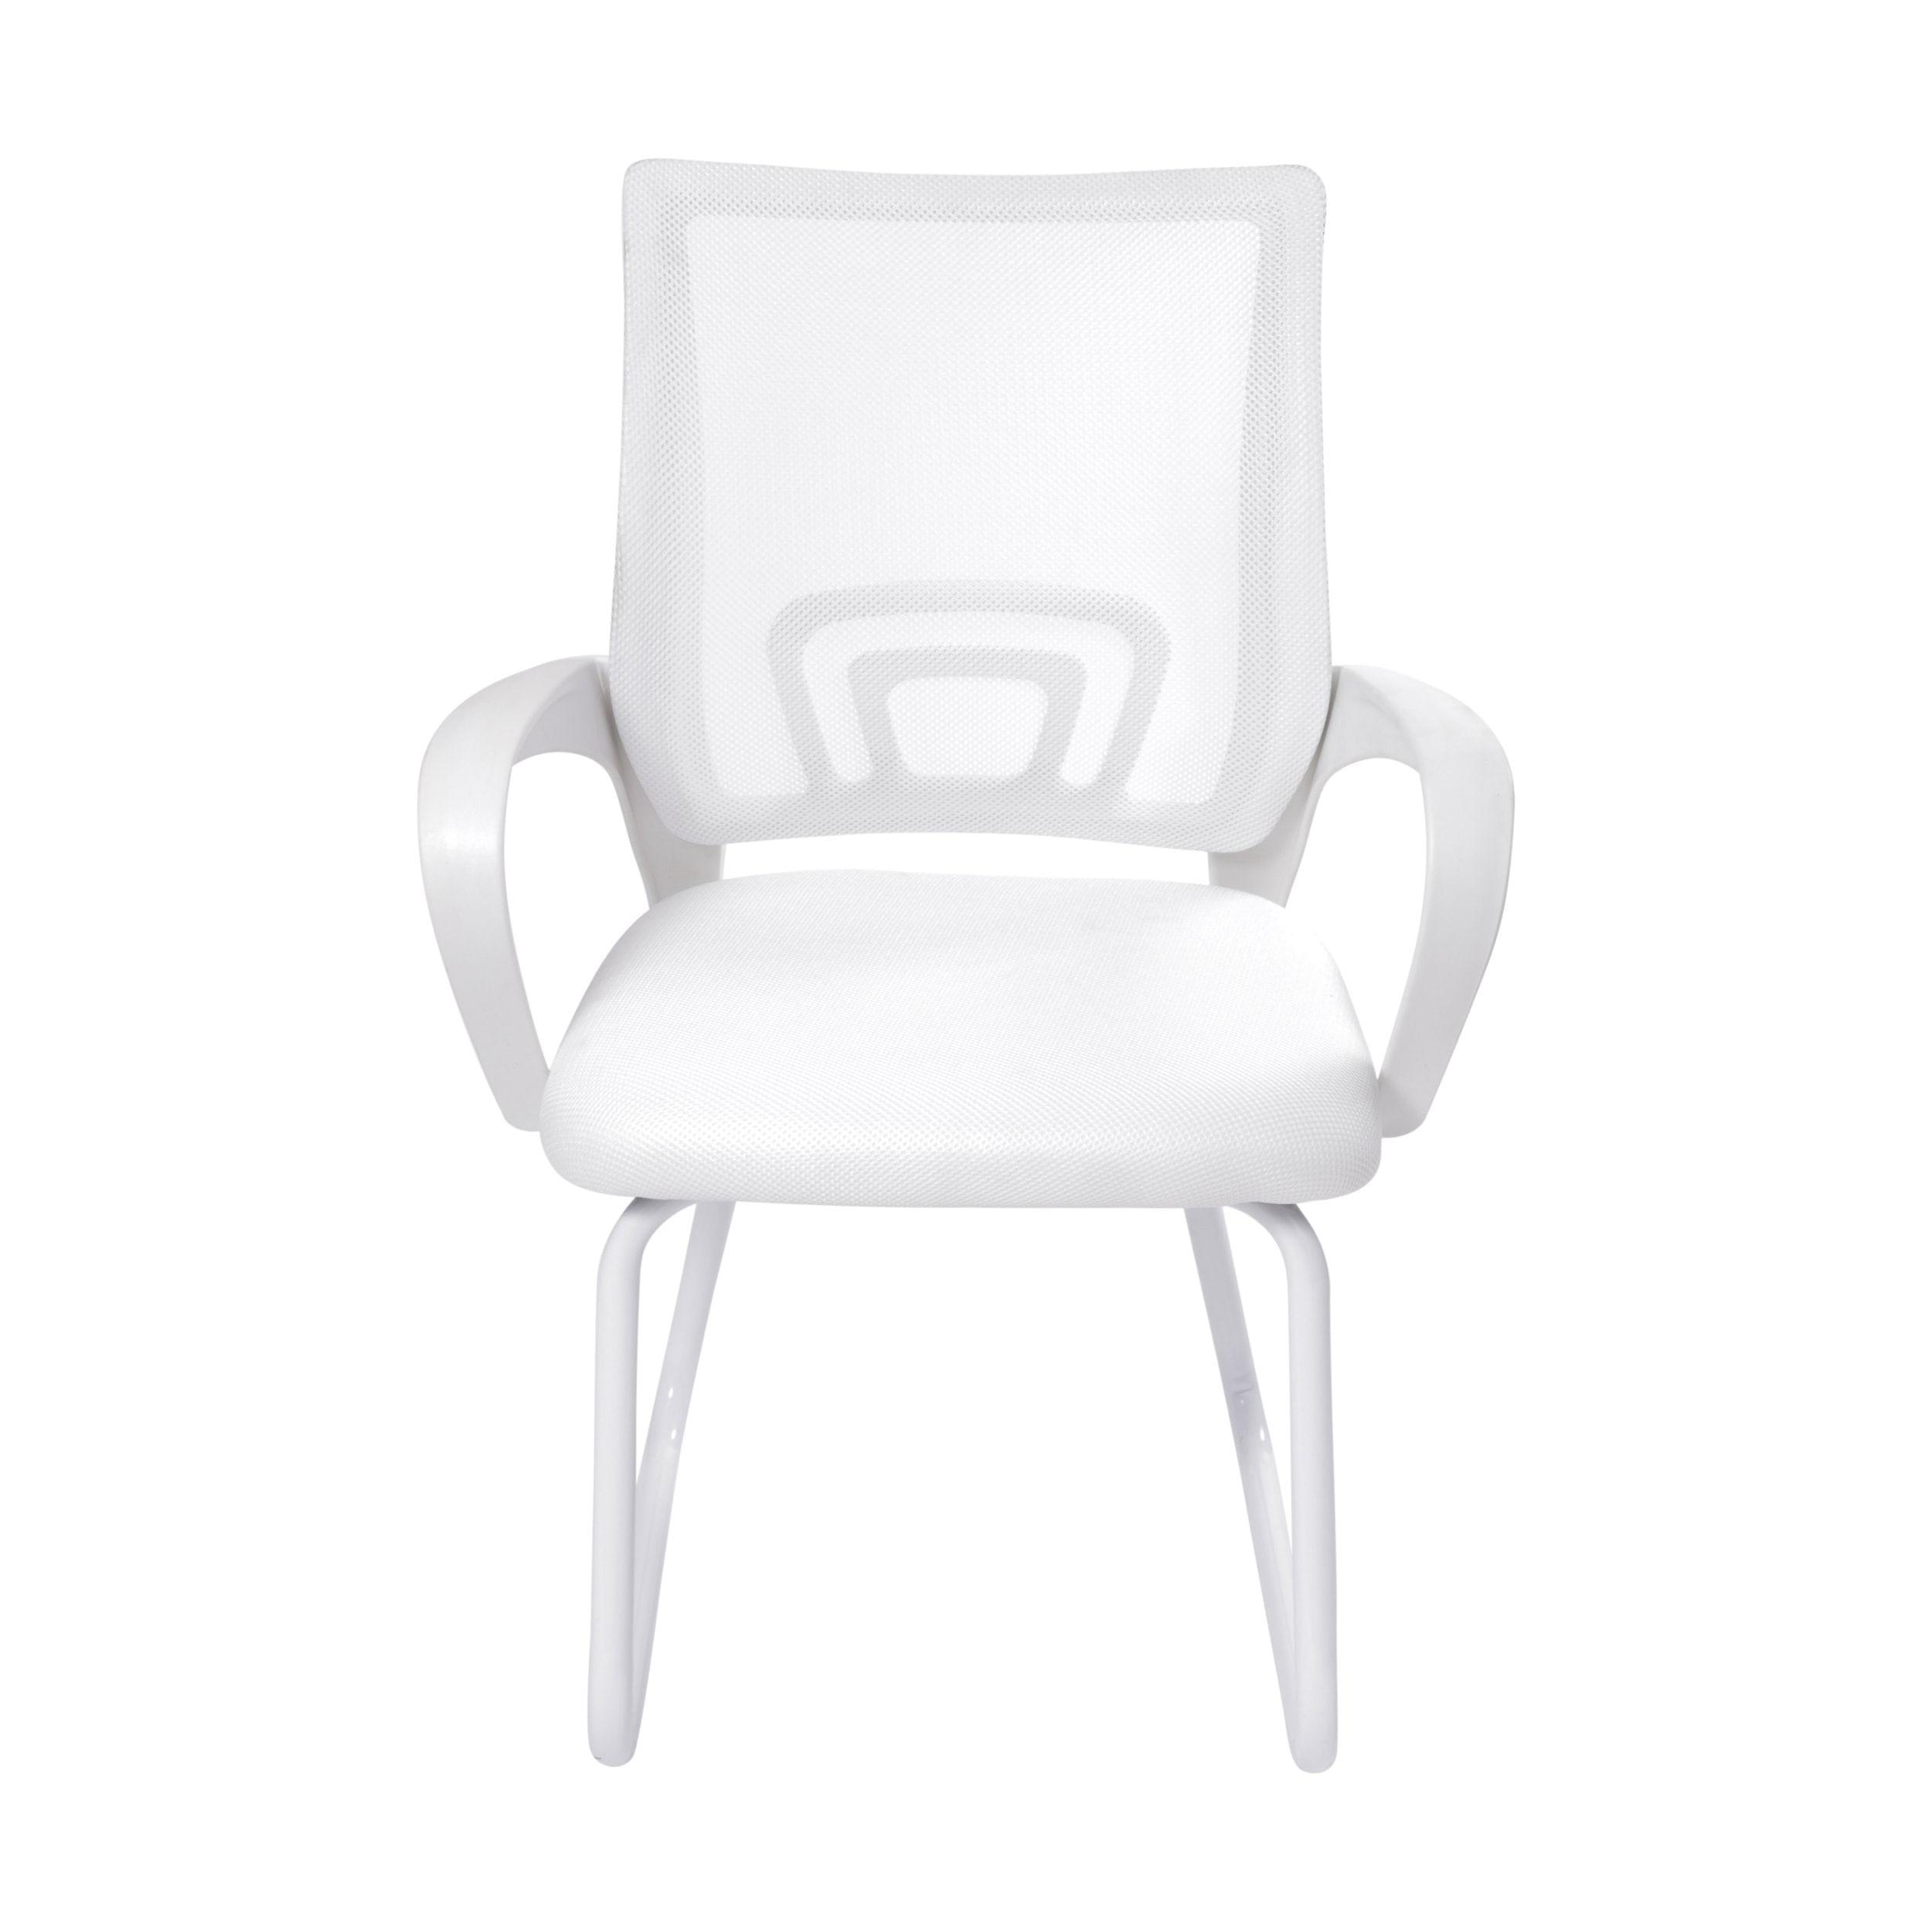 Cadeira Office Osorno Tela Mesh Branca com Base Fixa Branca - 51832